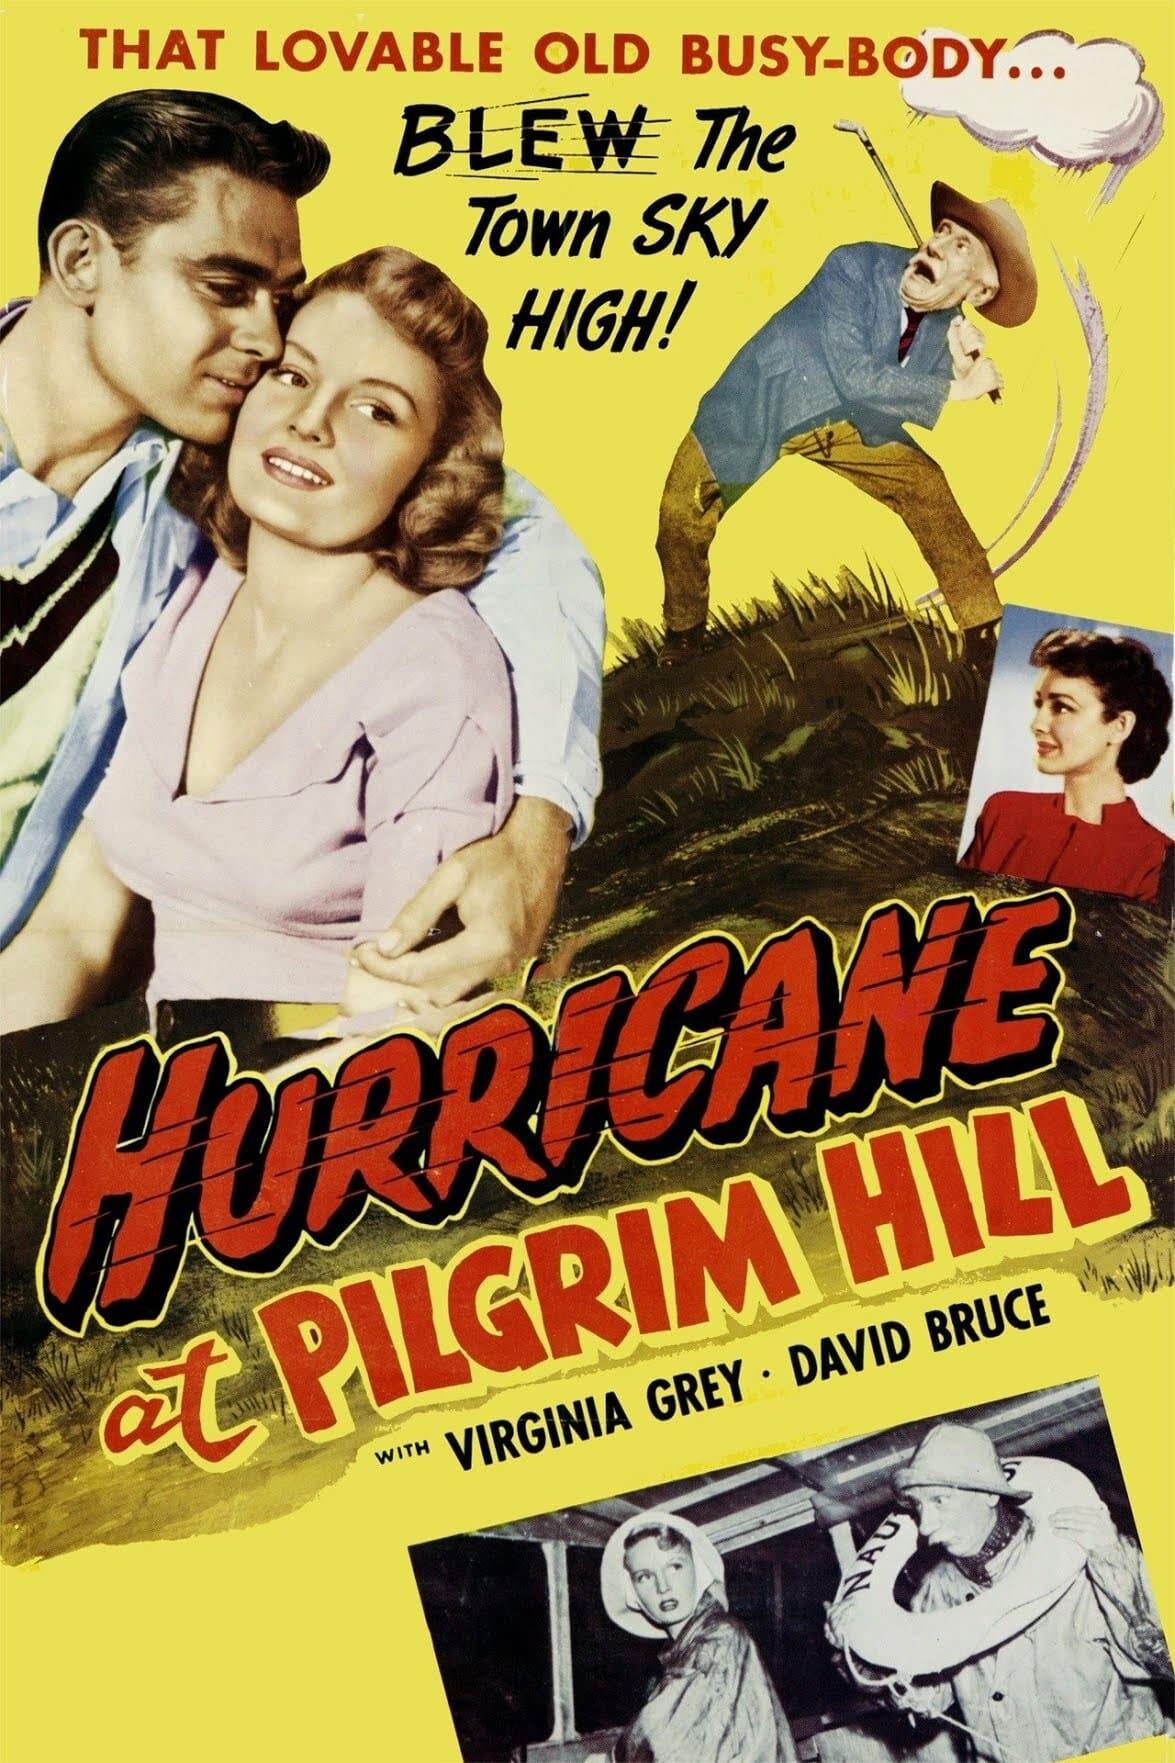 Hurricane at Pilgrim Hill